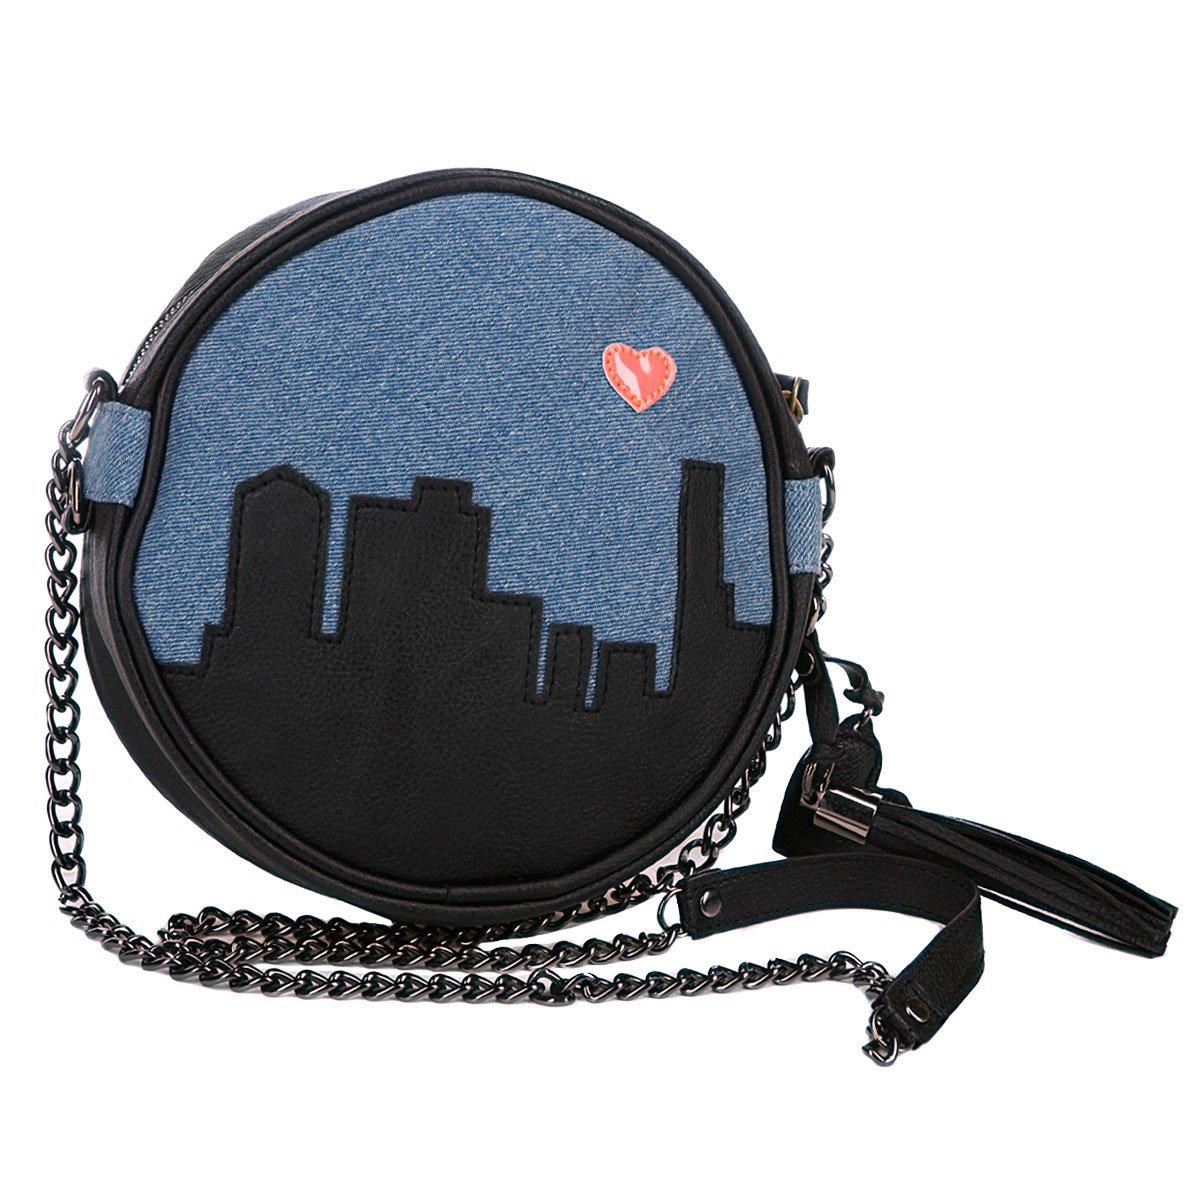 6fcd1c88e110 Купить сумку женскую Stussy X Love Made Purse Indigo (291012fred53) в  интернет-магазине Proskater.by